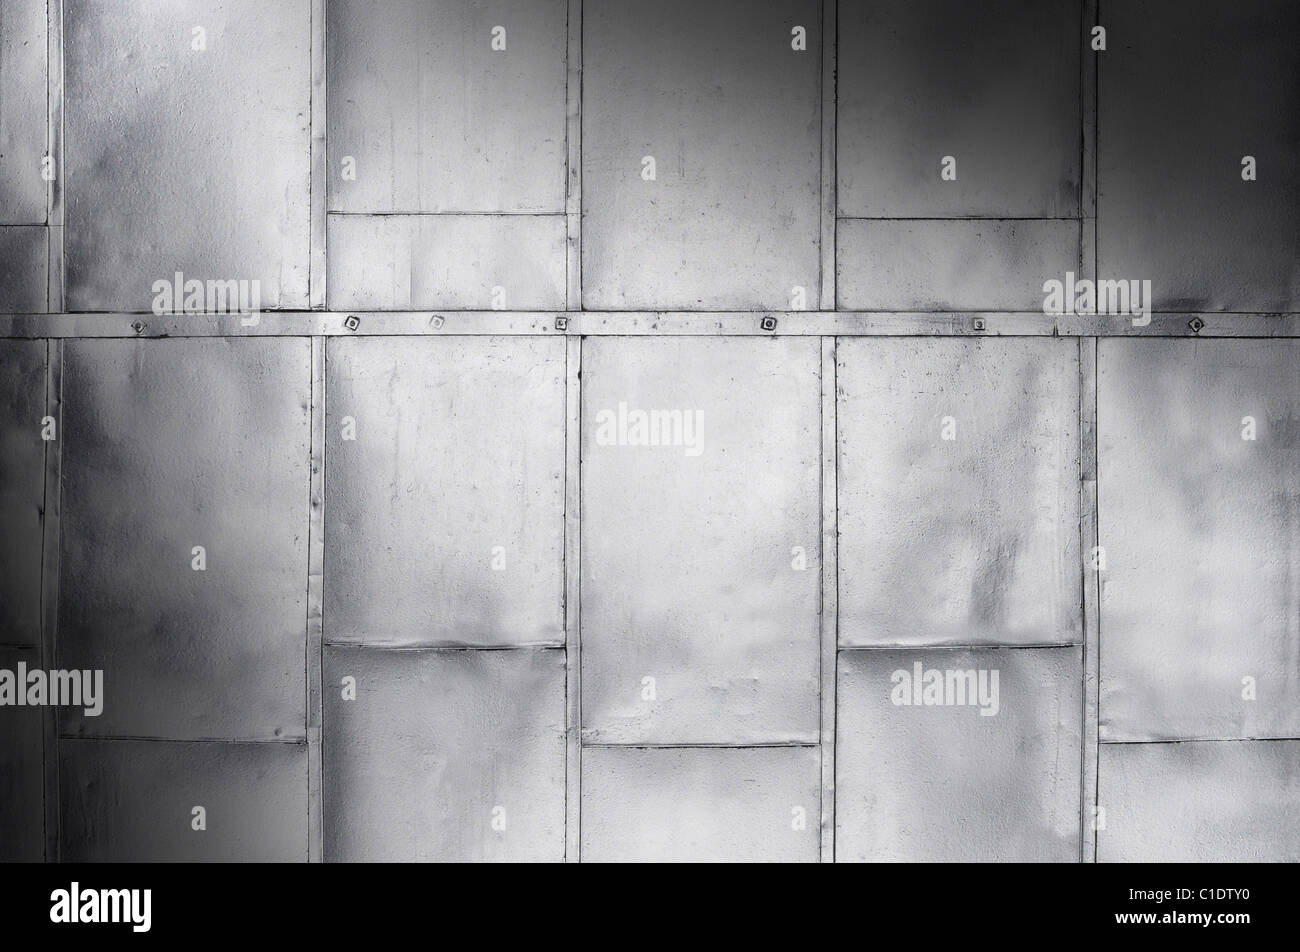 Metal panels on industrial door or wall lit diagonally - Stock Image